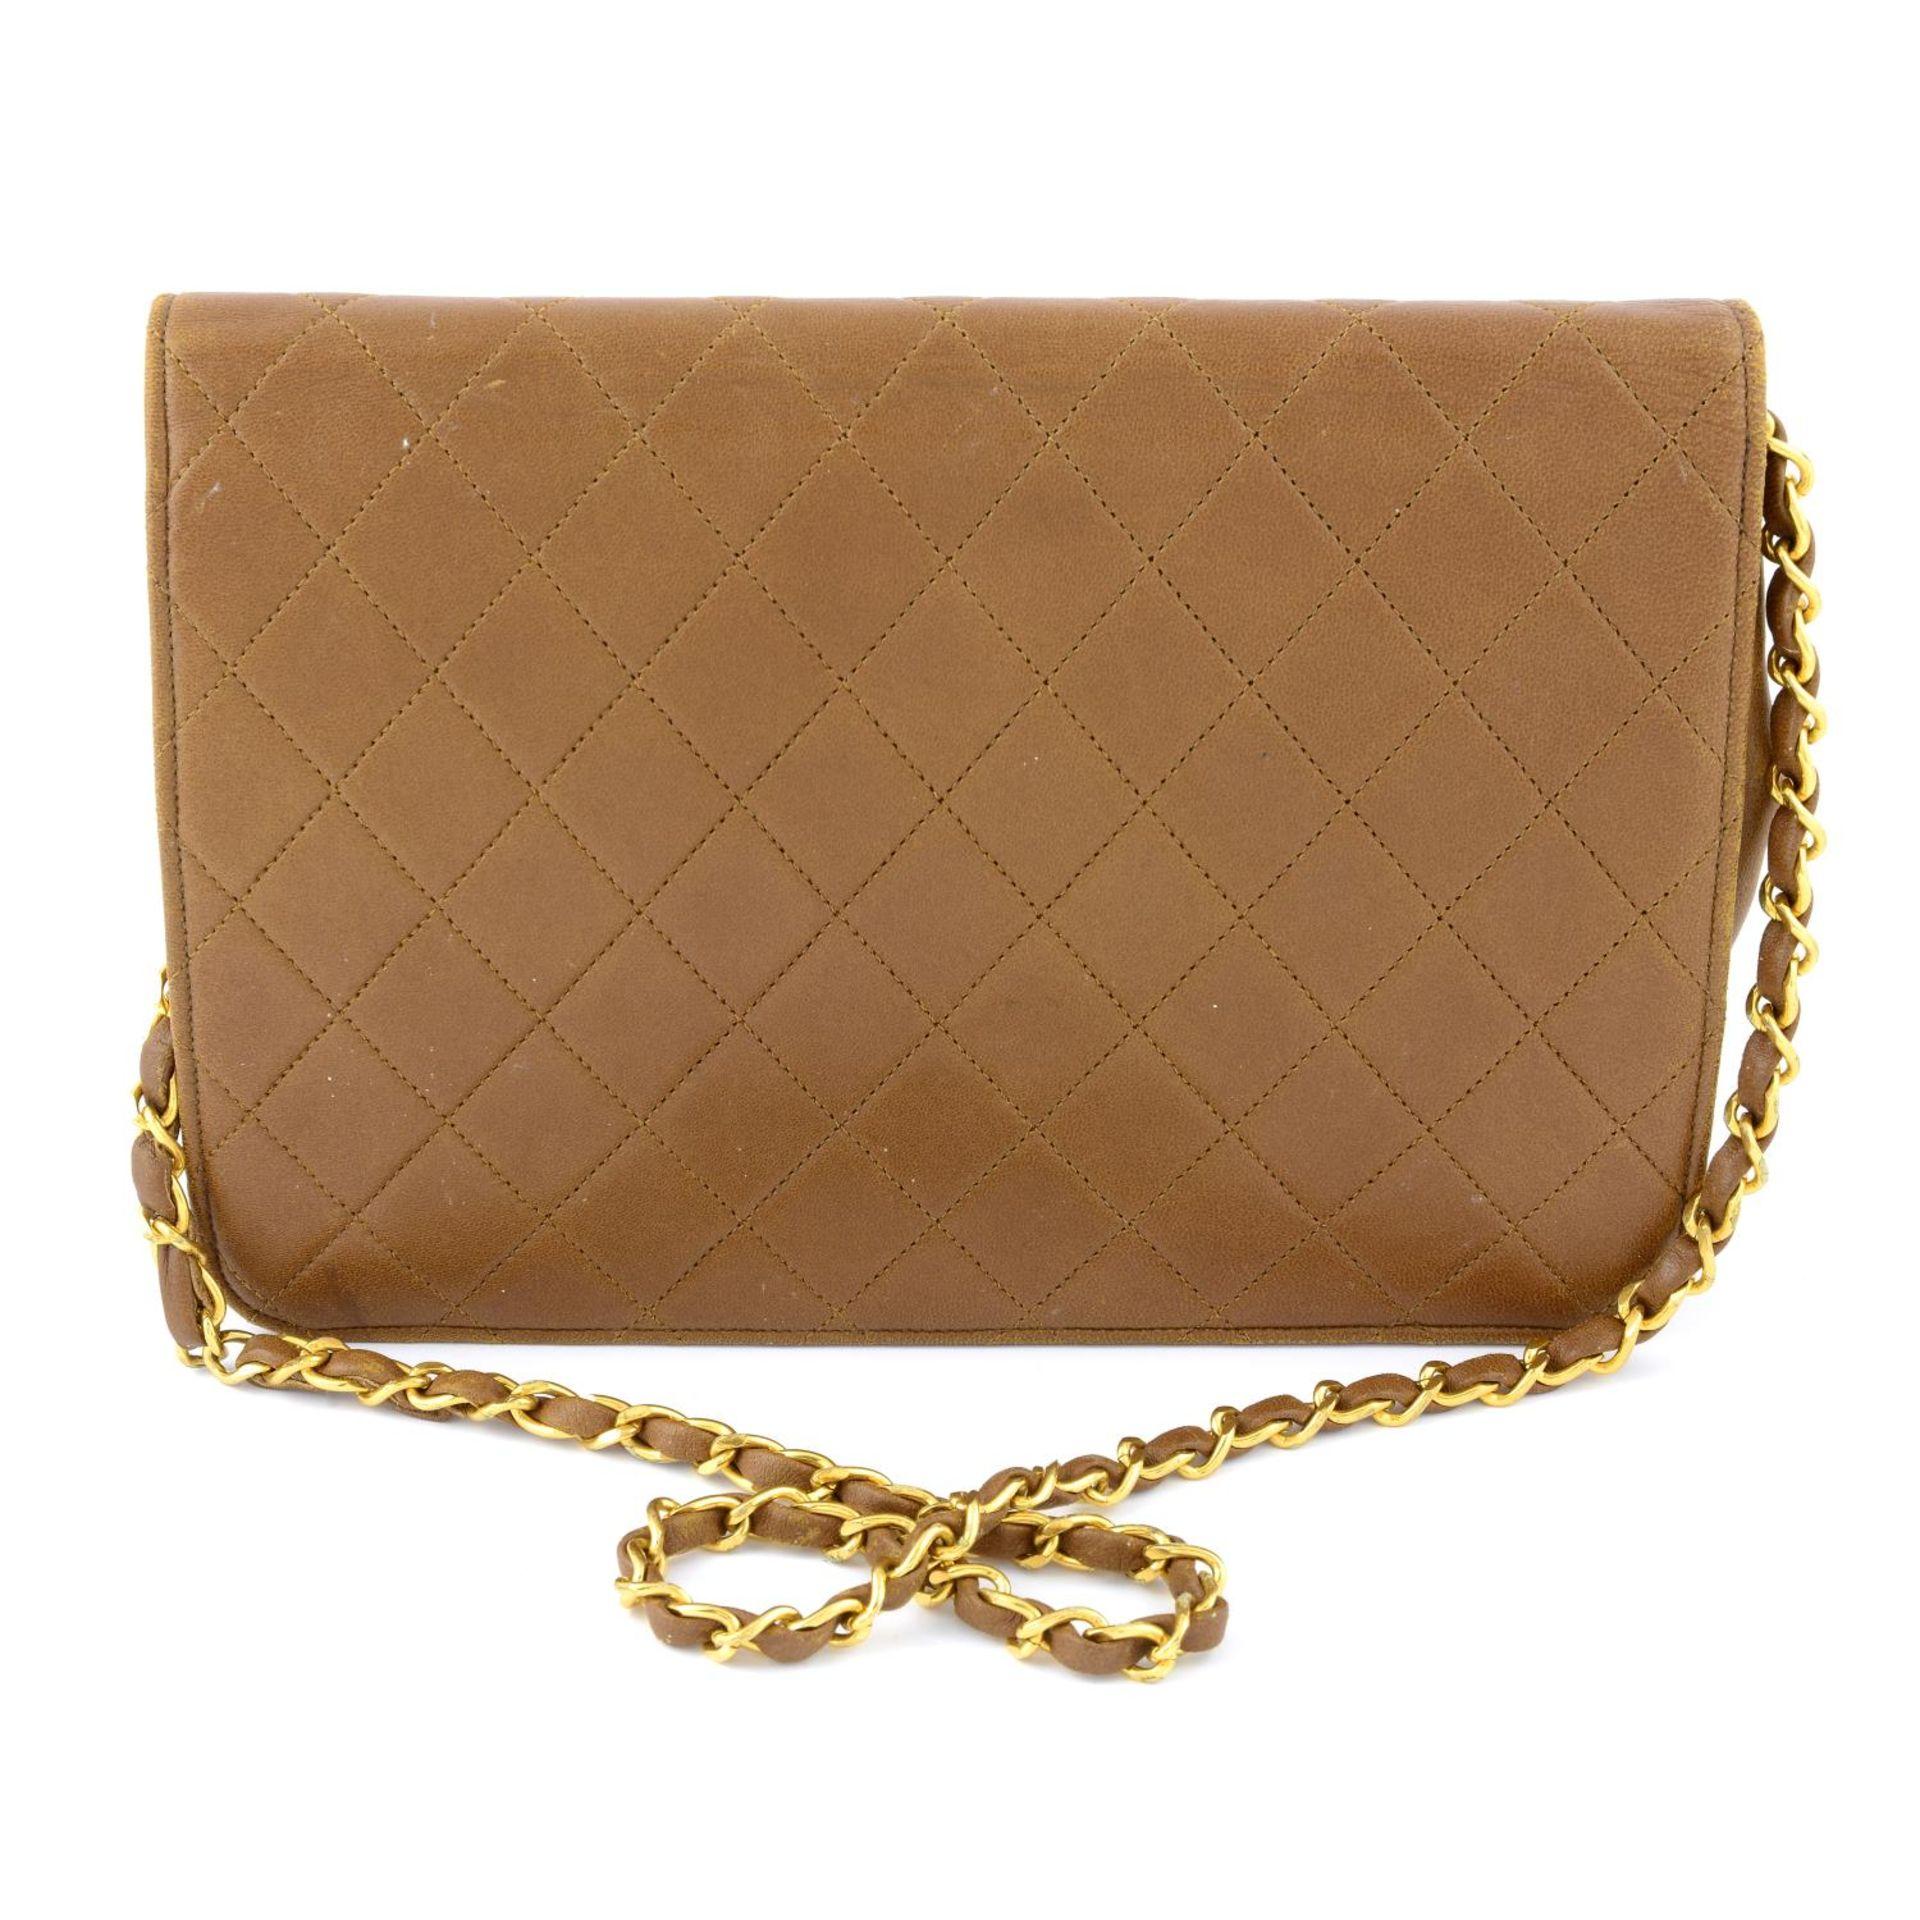 CHANEL - a vintage tan single flap handbag. - Image 2 of 5